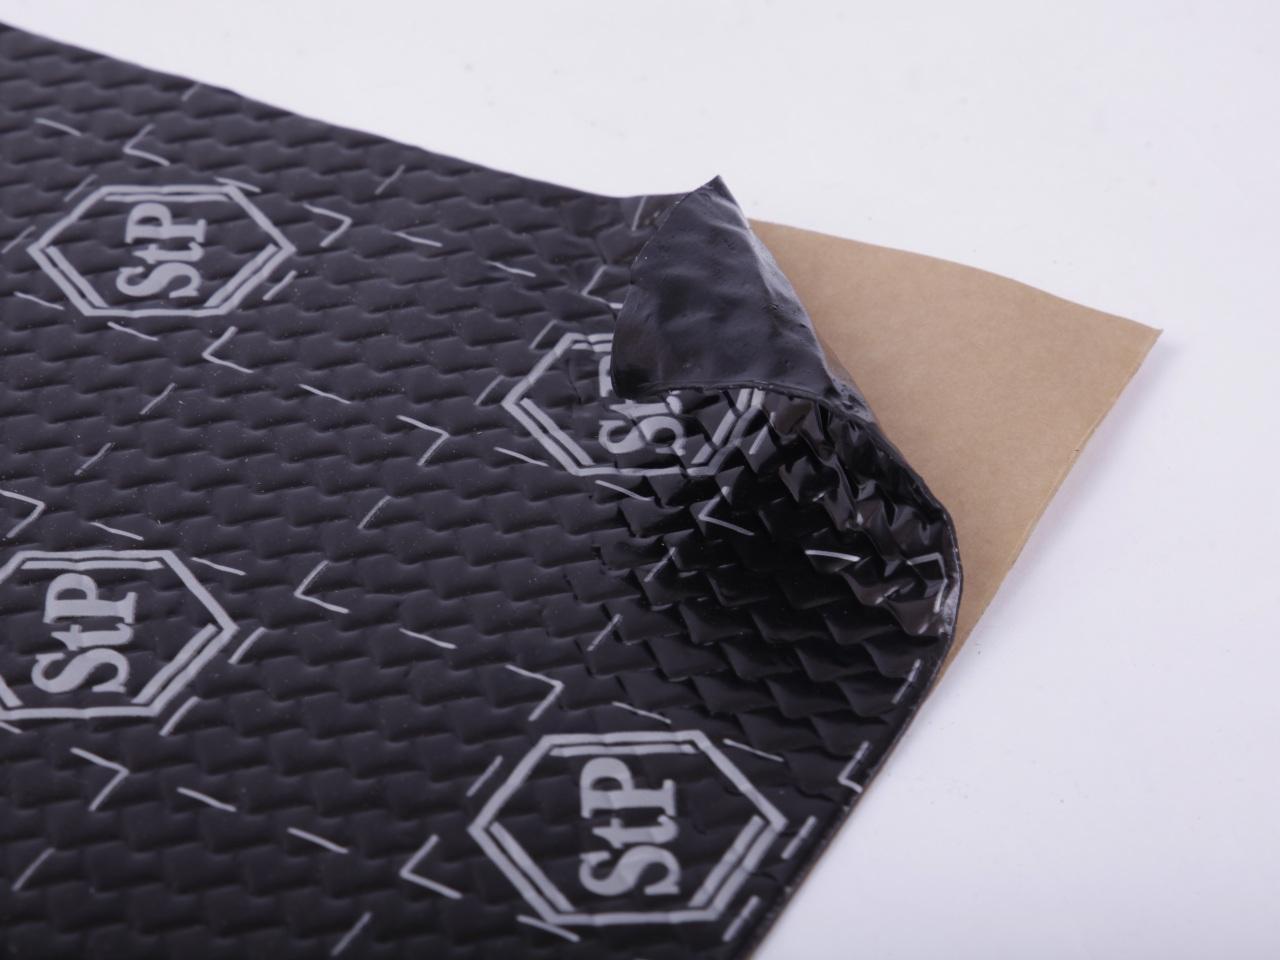 StP Black Silver Speaker Pack - 2 pieces insulation mats | Damping Material | Accessories | Hifi & Navigation | carfeature.de - Car Hifi Shop